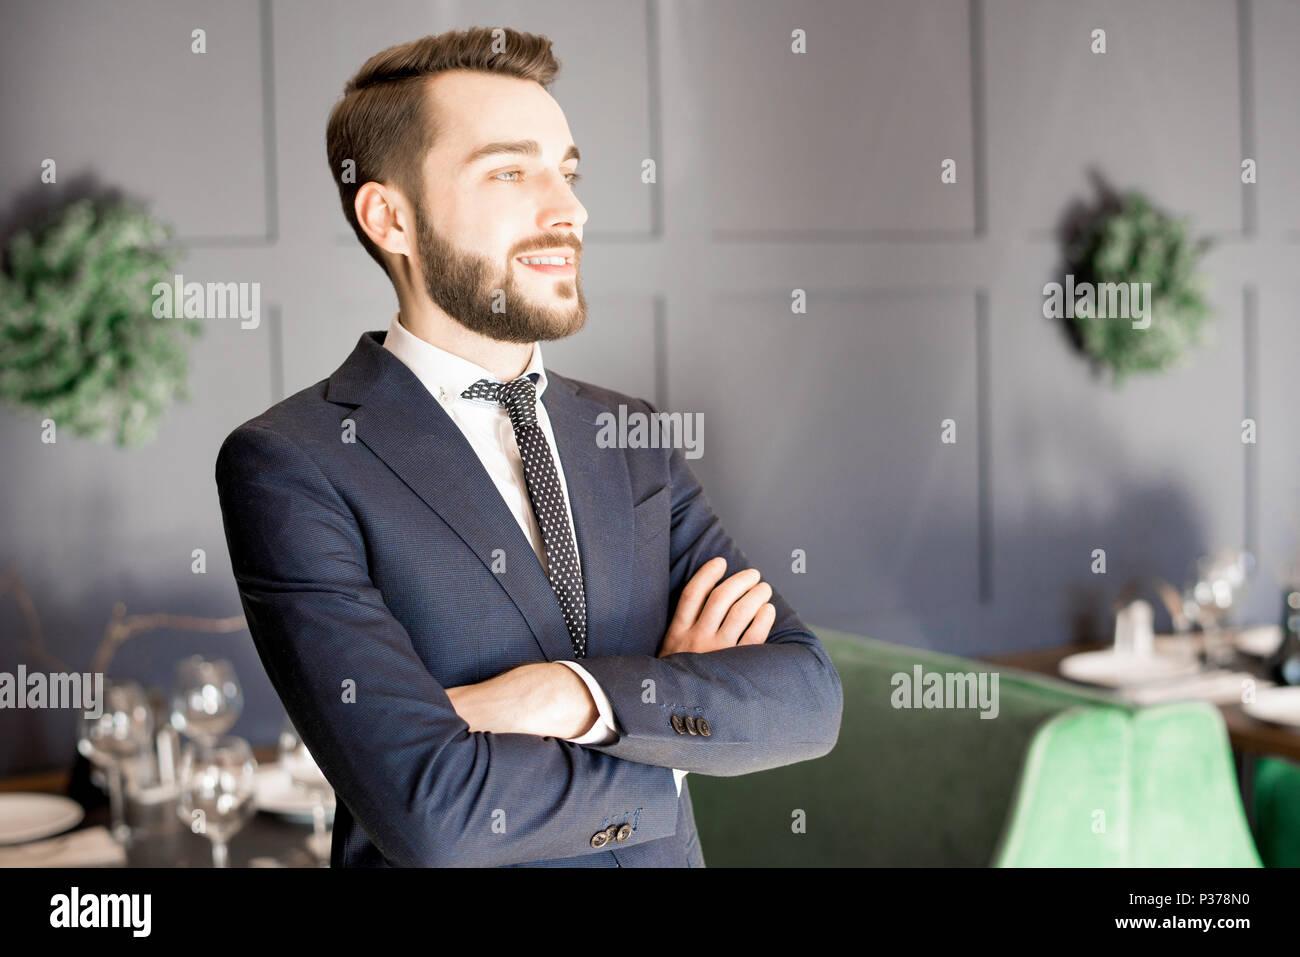 Fröhliche ehrgeizige Restaurant Eigentümer Stockbild